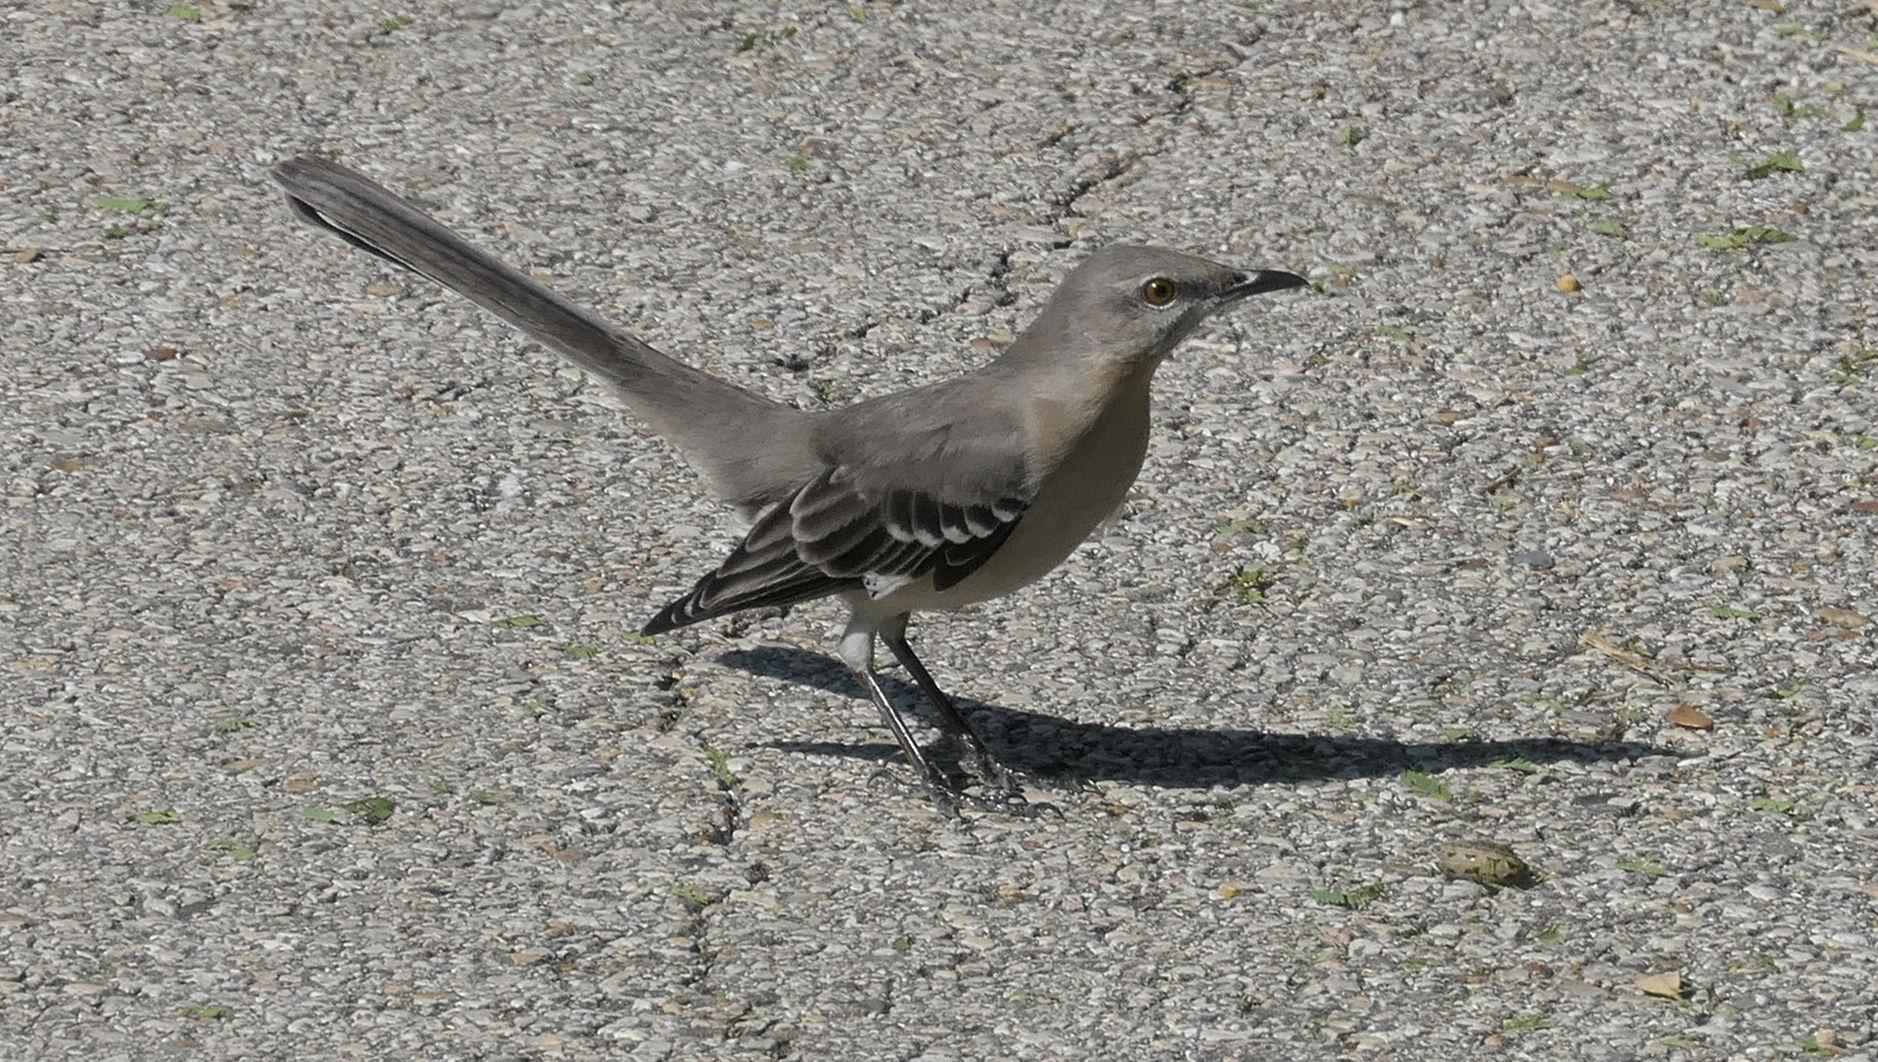 mocking bird on path